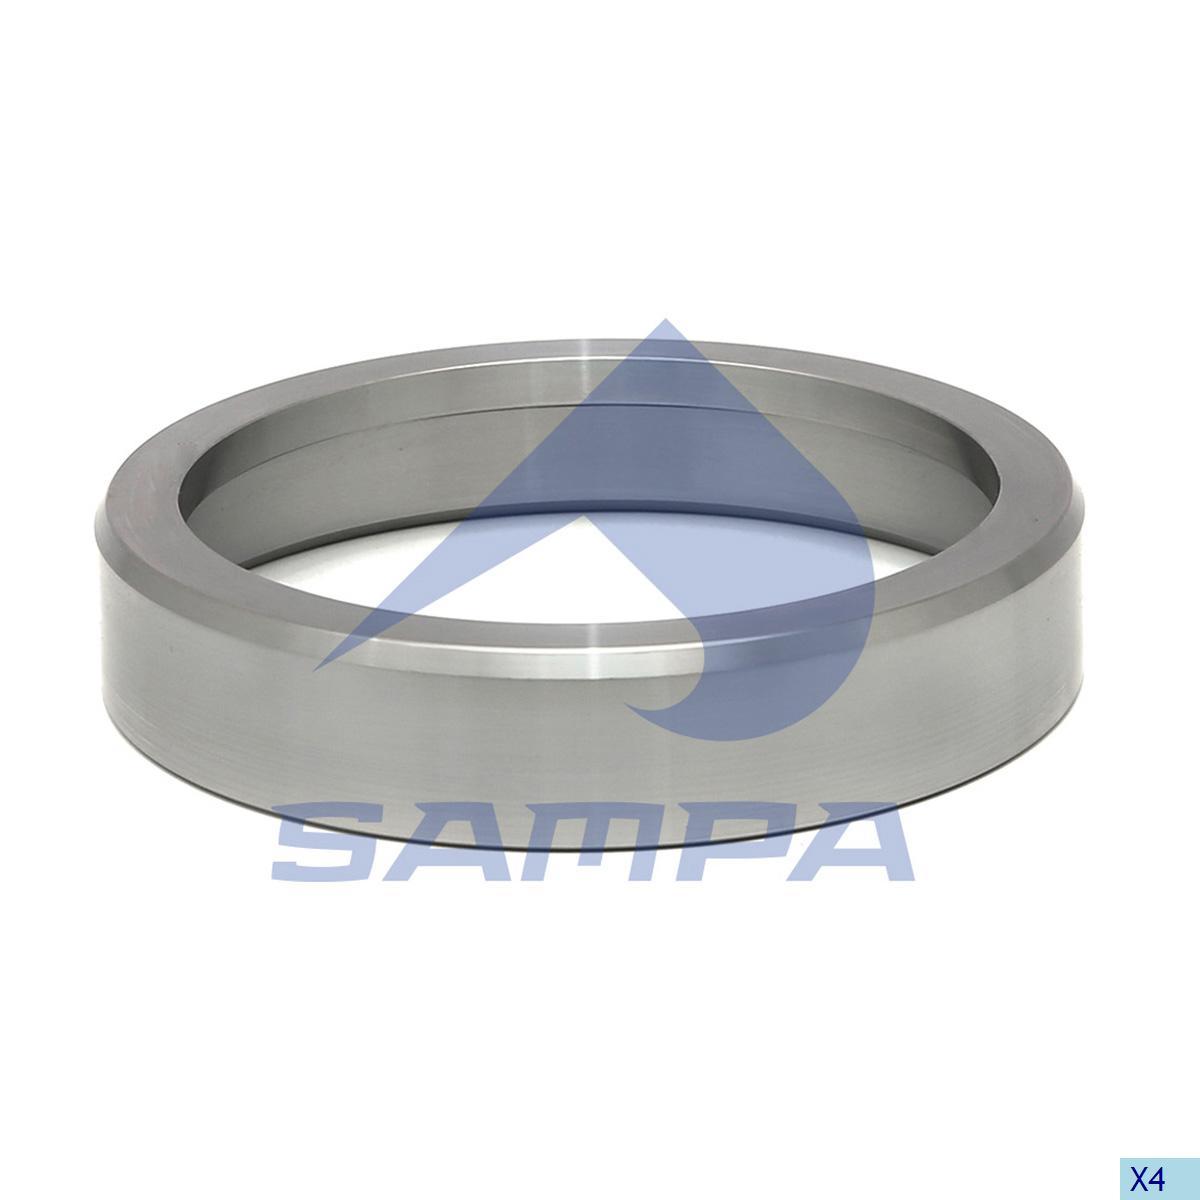 Wear Ring, Bogie Suspension, Scania, Suspension